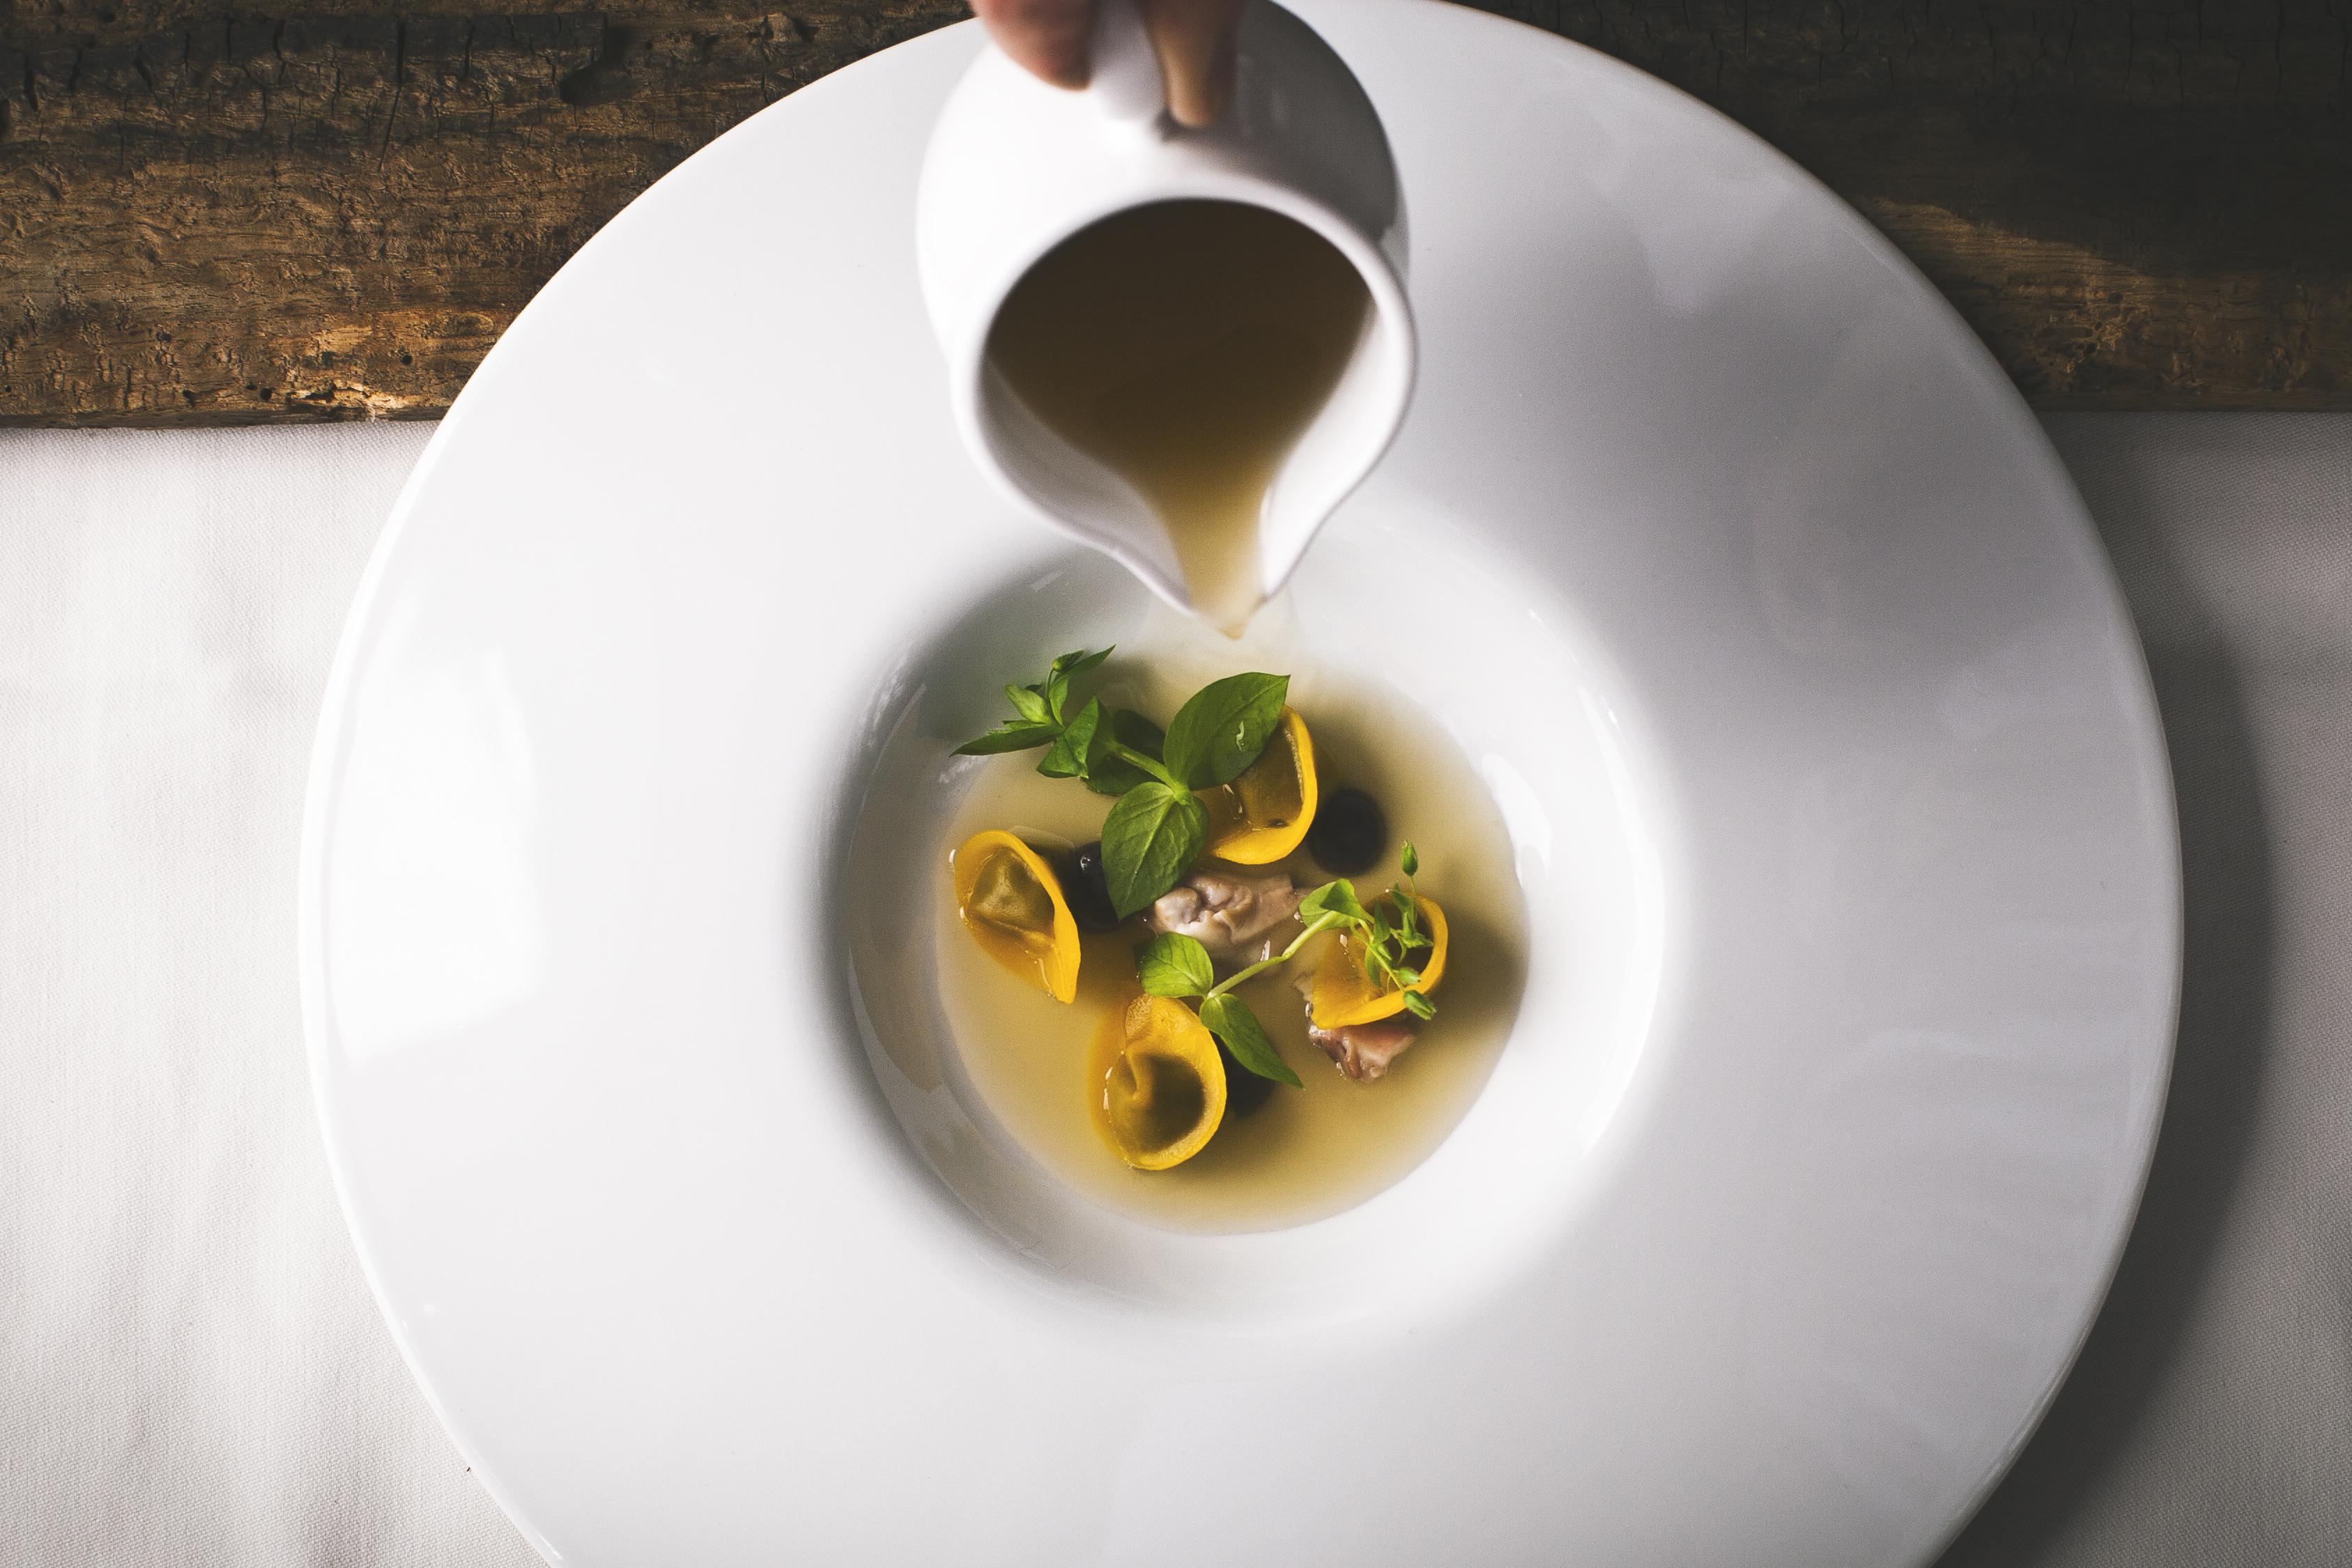 Ana Ros Videos a peek into chef ana ros' kitchen   cnn travel